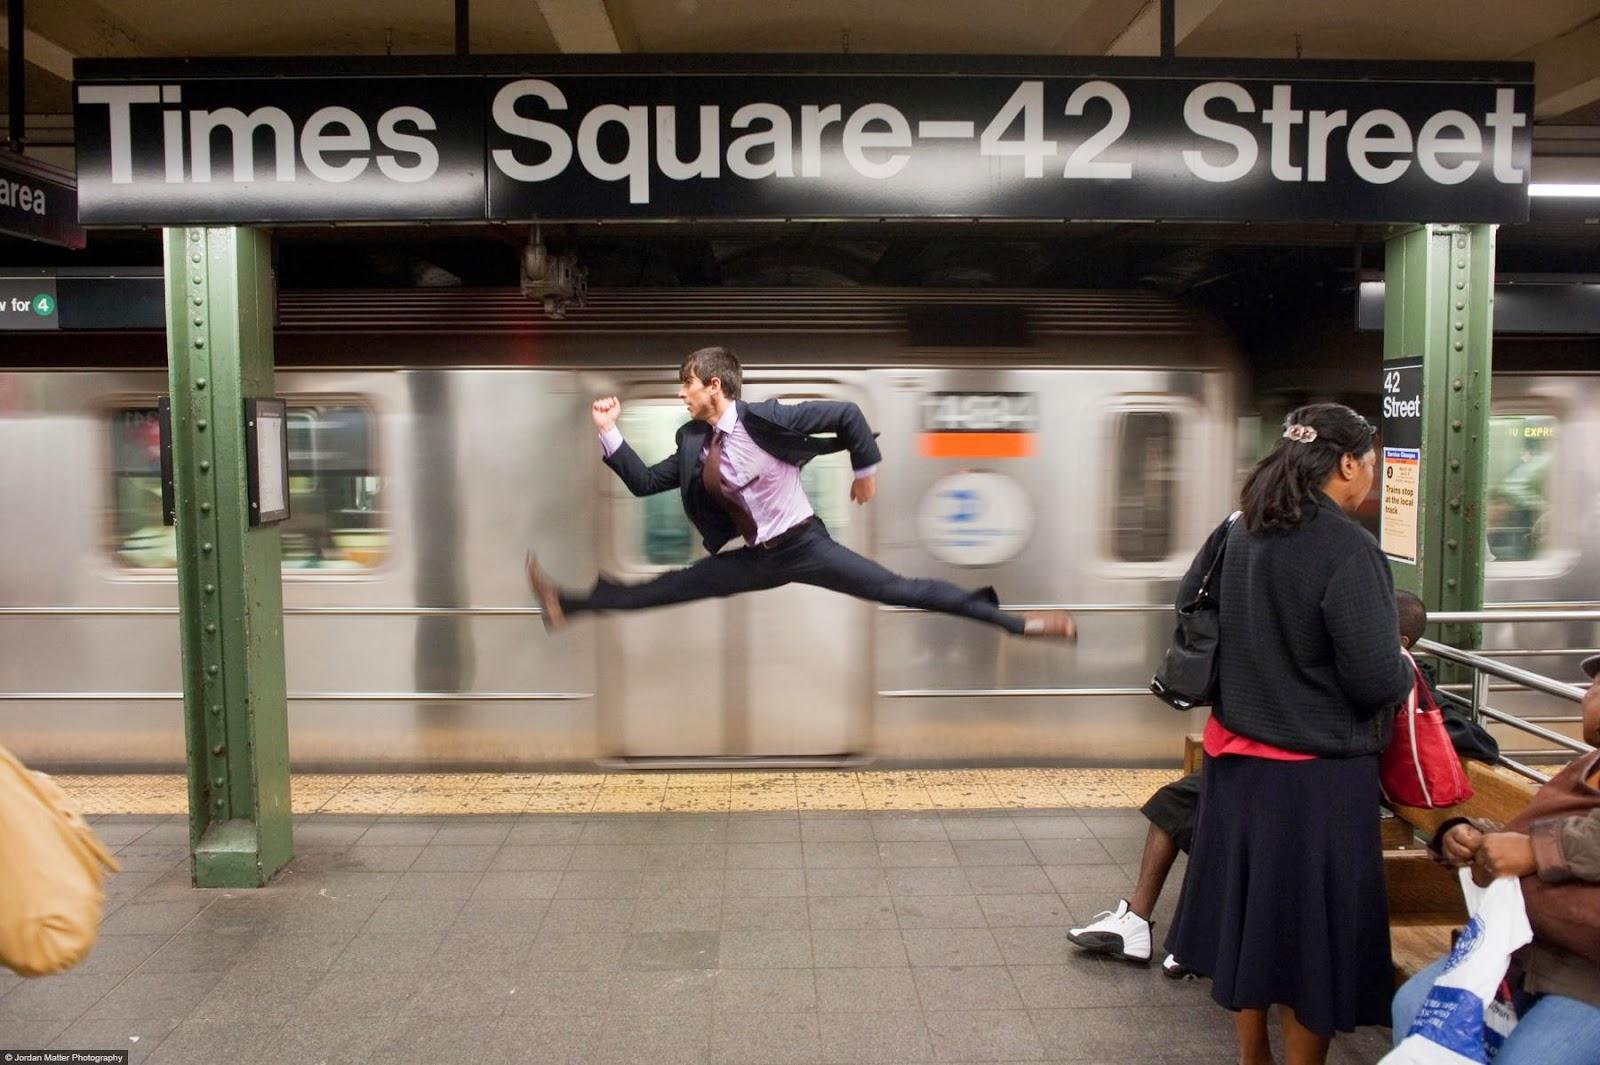 ©Jordan Matter. Dancers among us. Fotografía | Photography